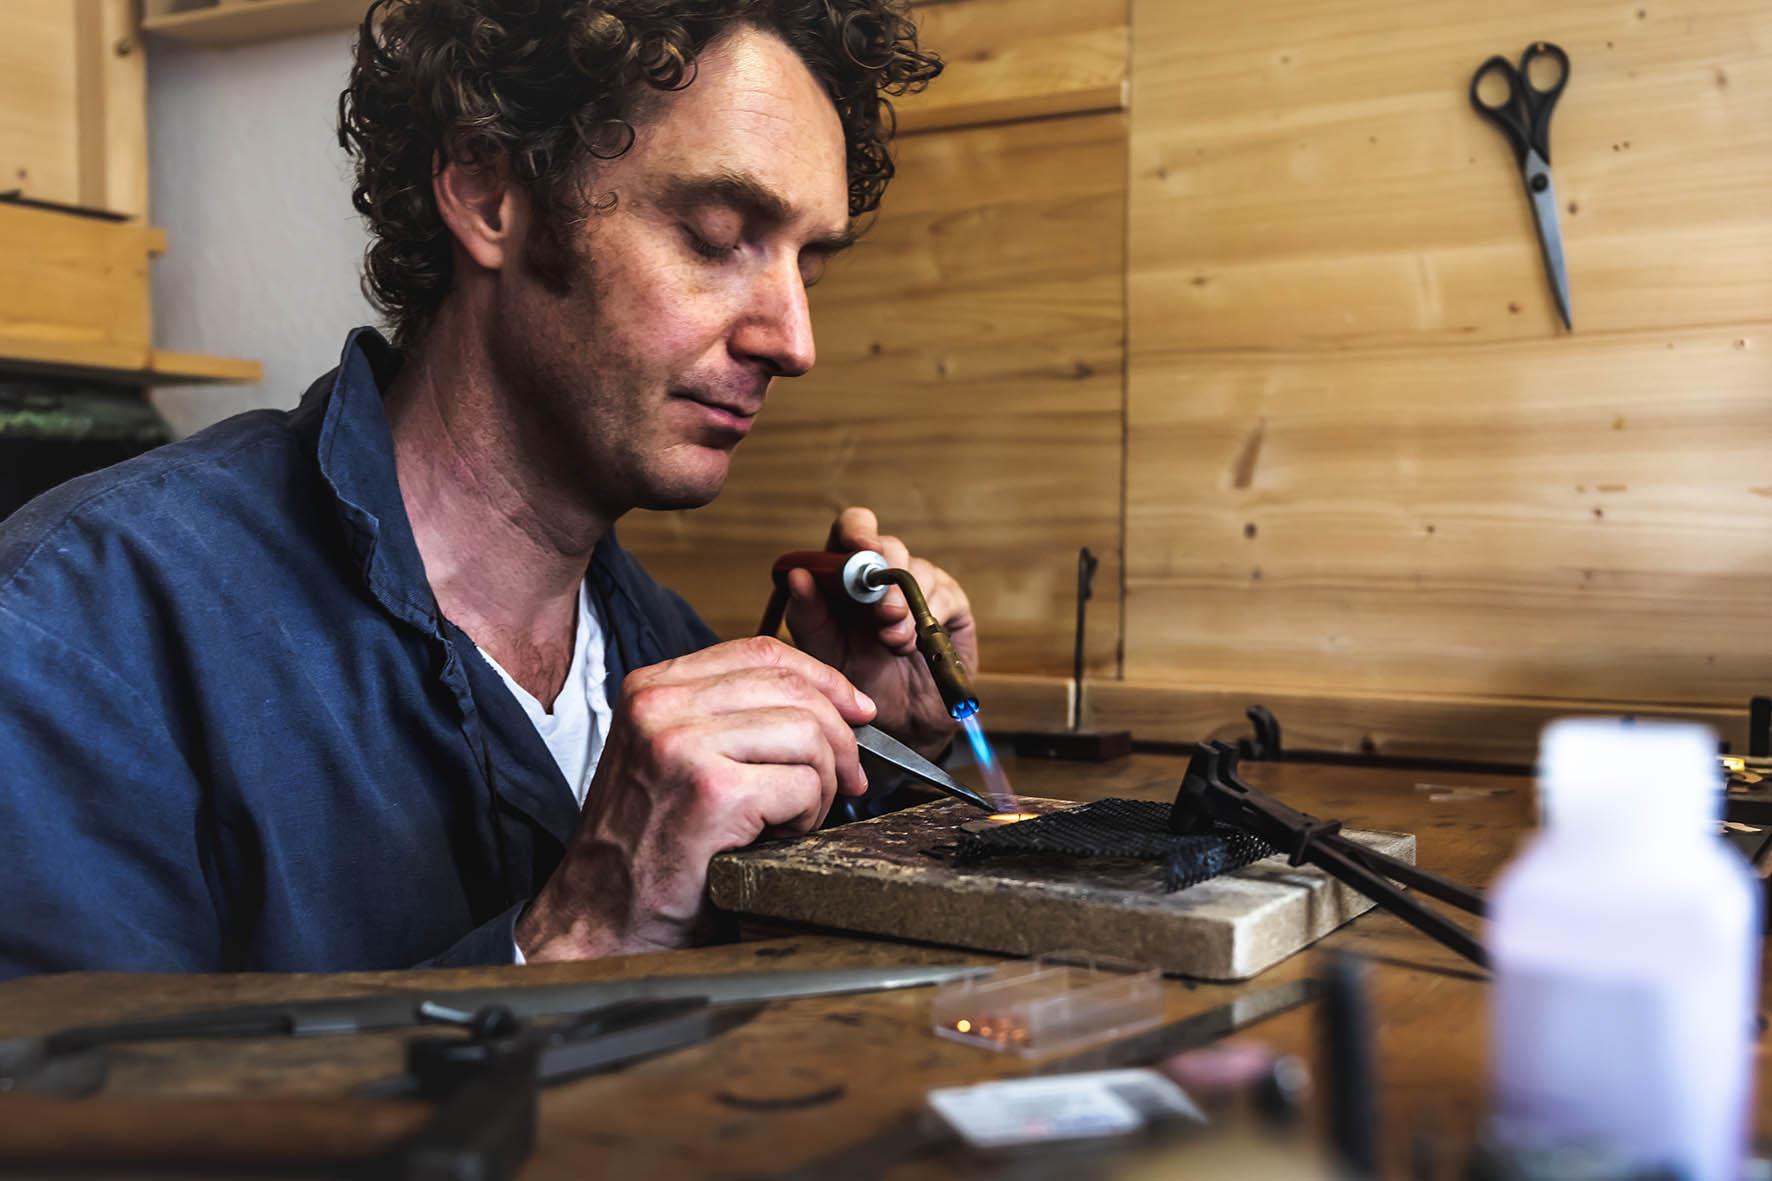 Uhrenmanufaktur - Atelier Horloges - Jochen Leopold